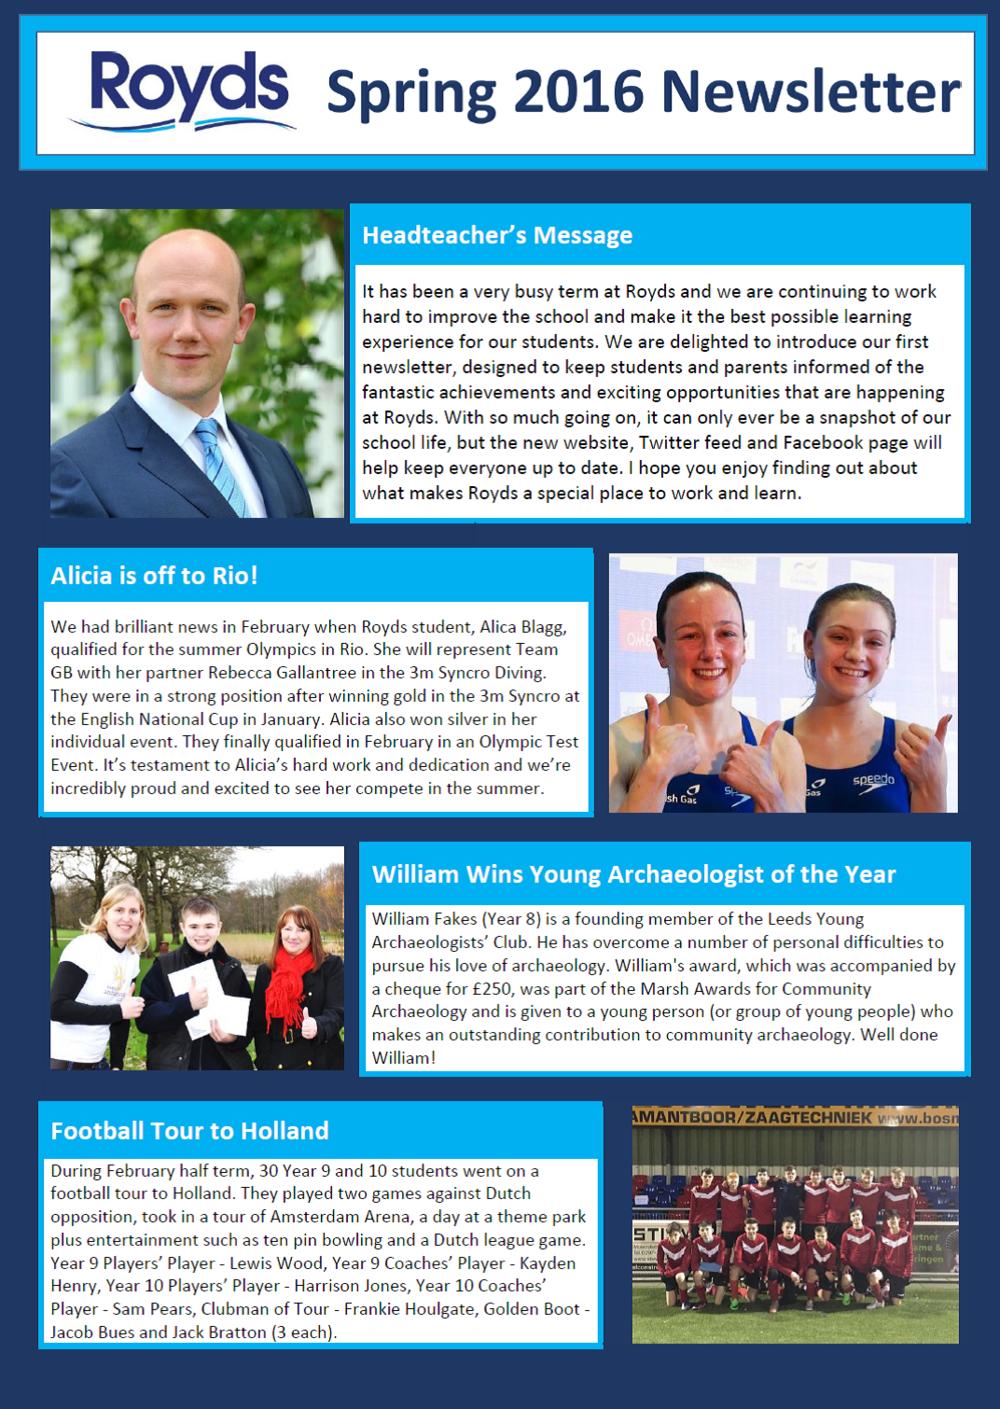 Royds Spring 2016 Newsletter